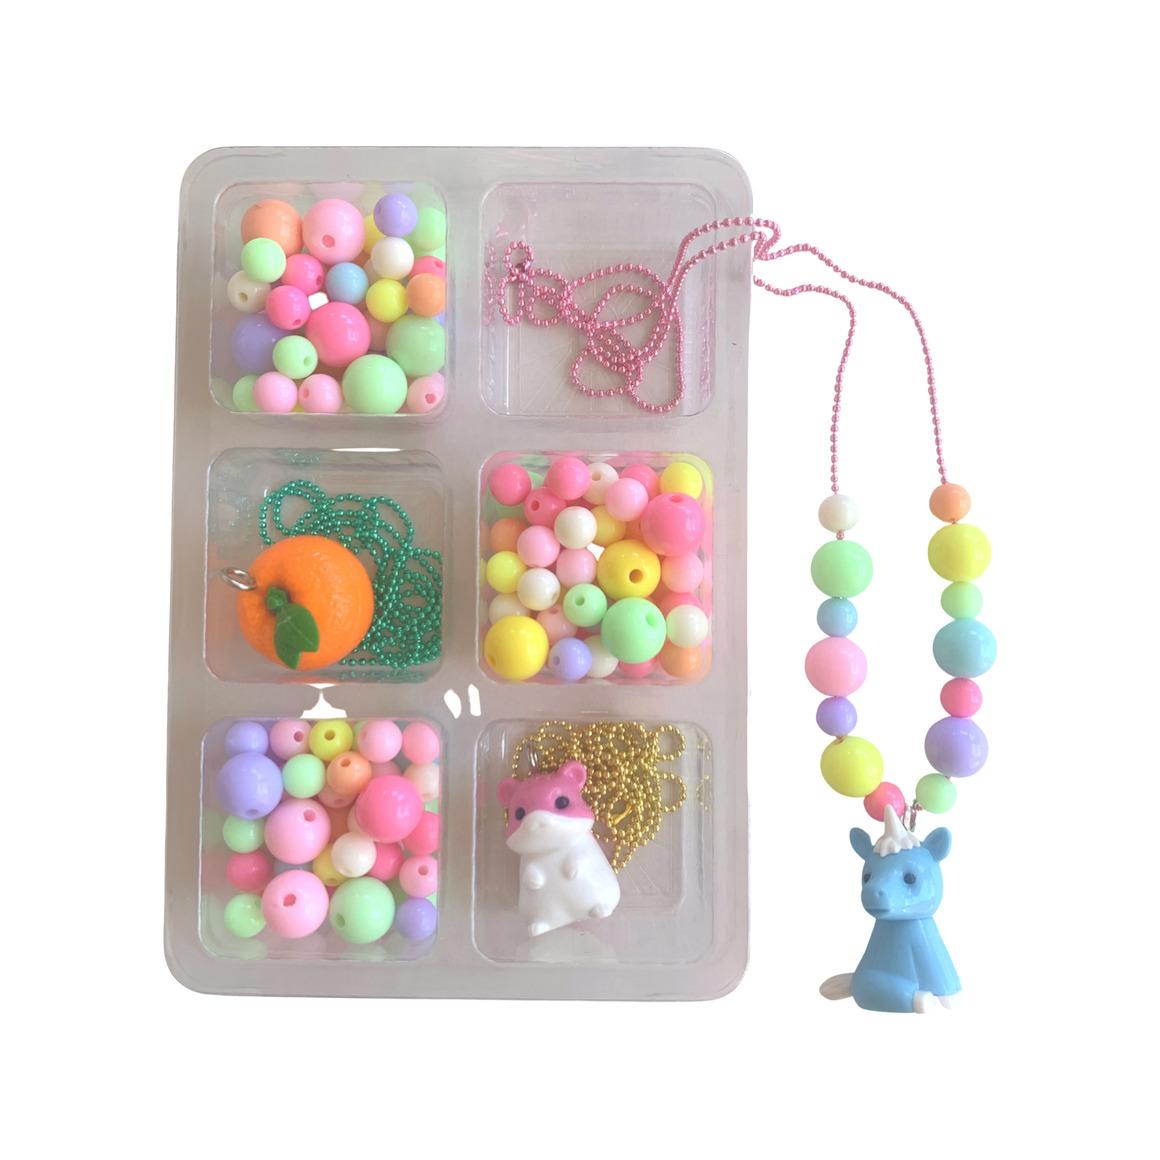 Deluxe Pop Cutie Necklace DIY Box L(Make your own necklaces) | Trada Marketplace